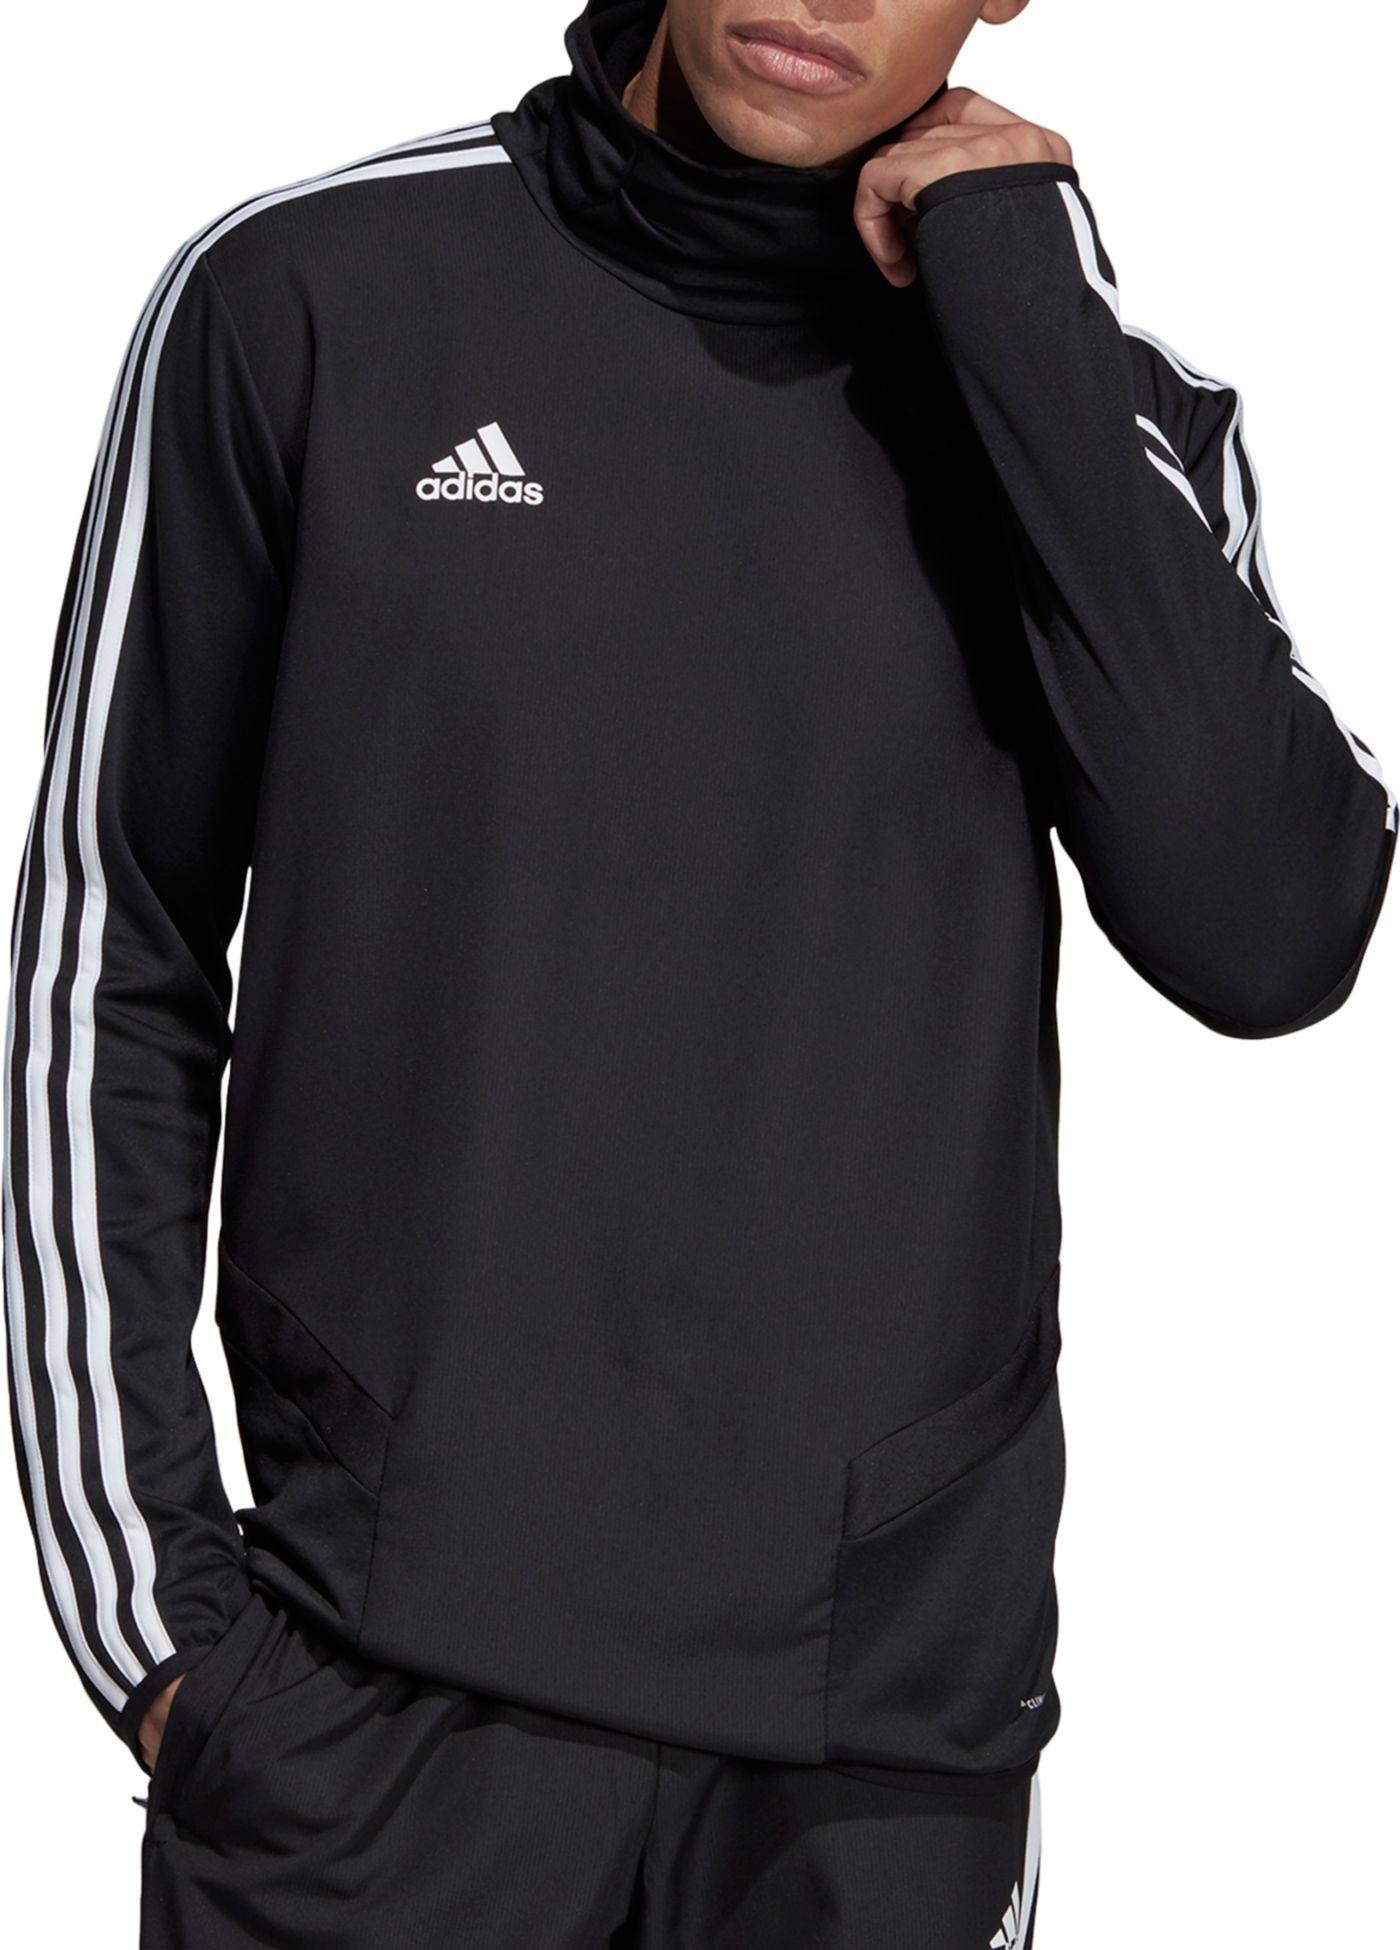 adidas Men's Tiro 19 Warm Long Sleeve Shirt